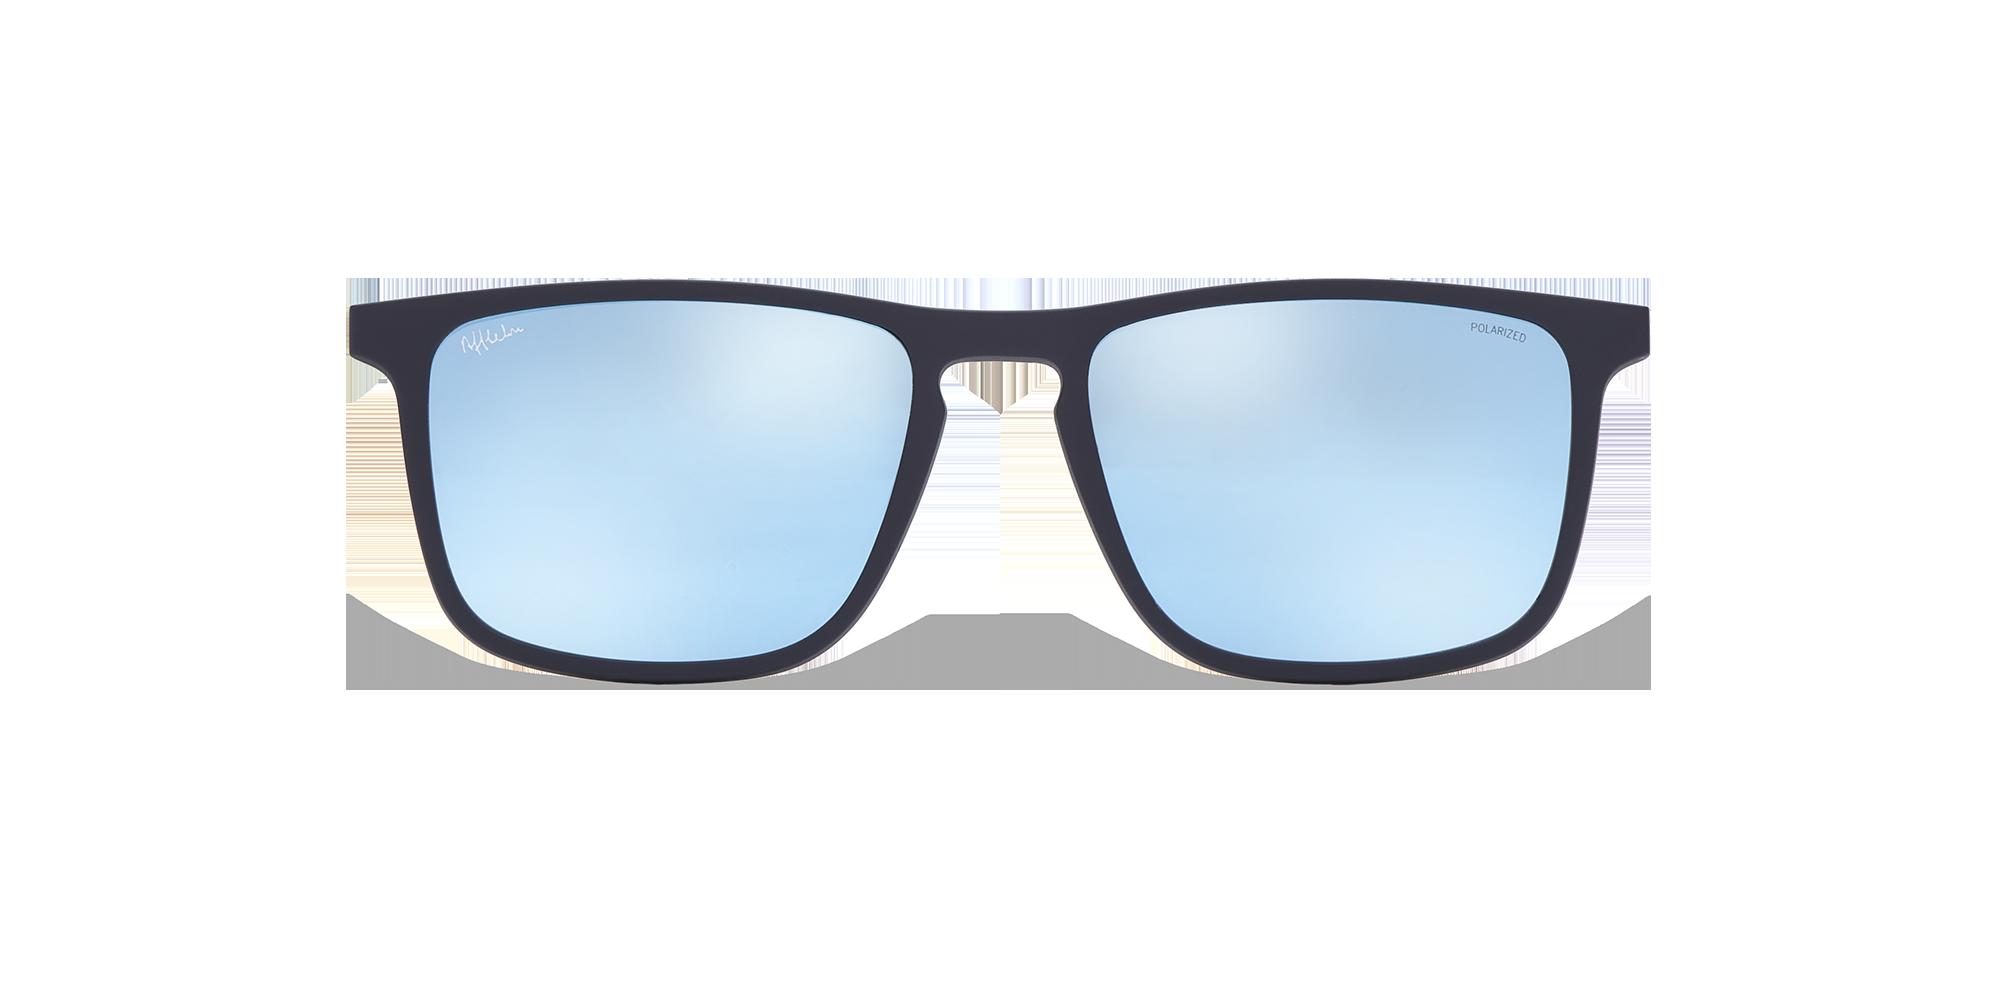 afflelou/france/products/smart_clip/clips_glasses/07630036428771_face.png